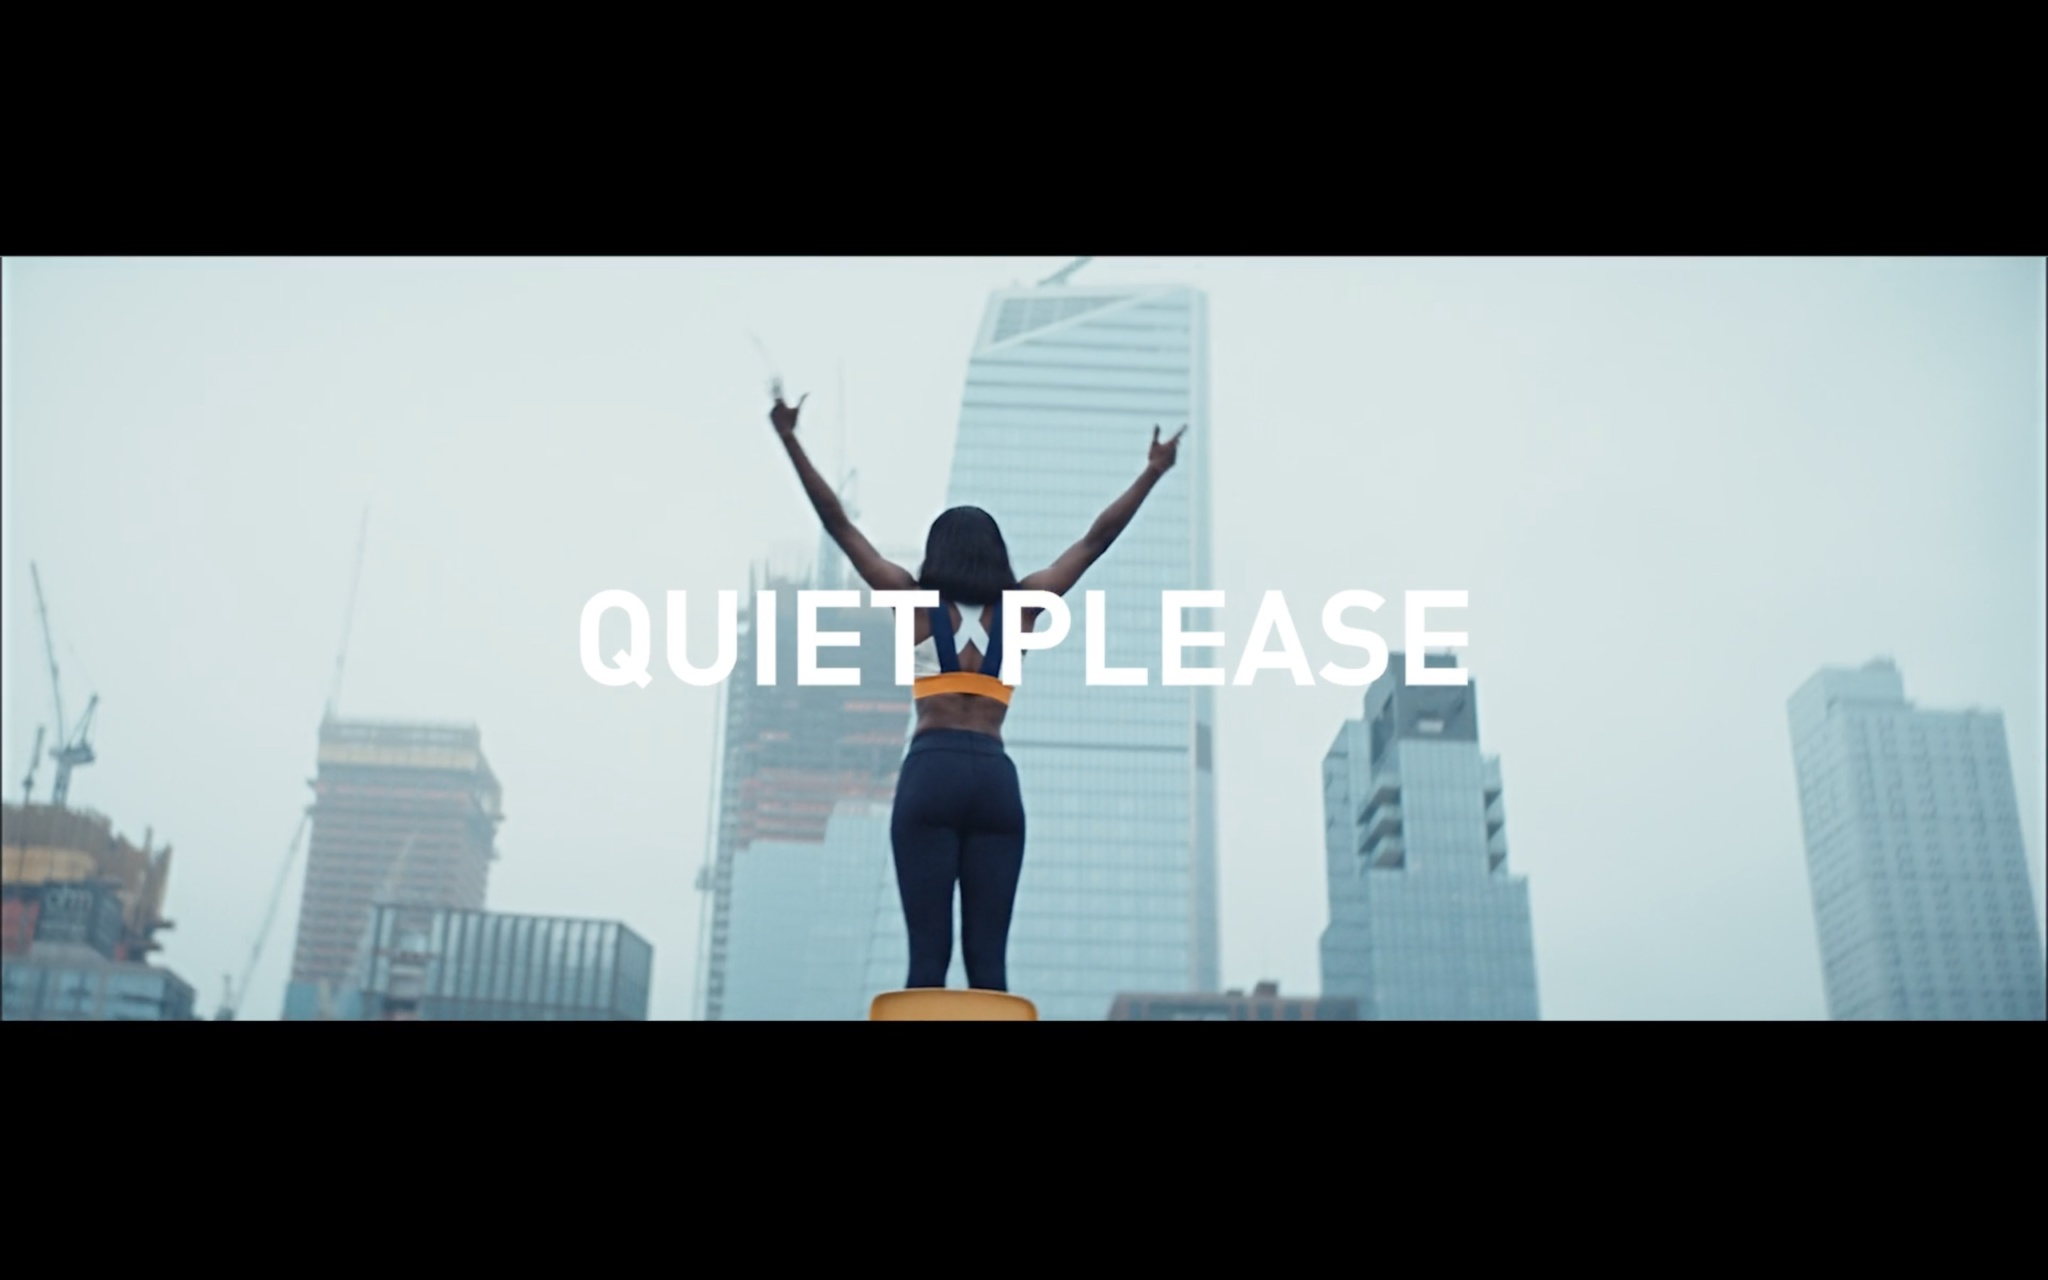 Steven Killian Design - Production Design - Designs - Art Department - Adidas Originals - Pharrell Williams - No Quiet Please - Don't Be Quiet Please - TheKillerLook.com - The Killer Look